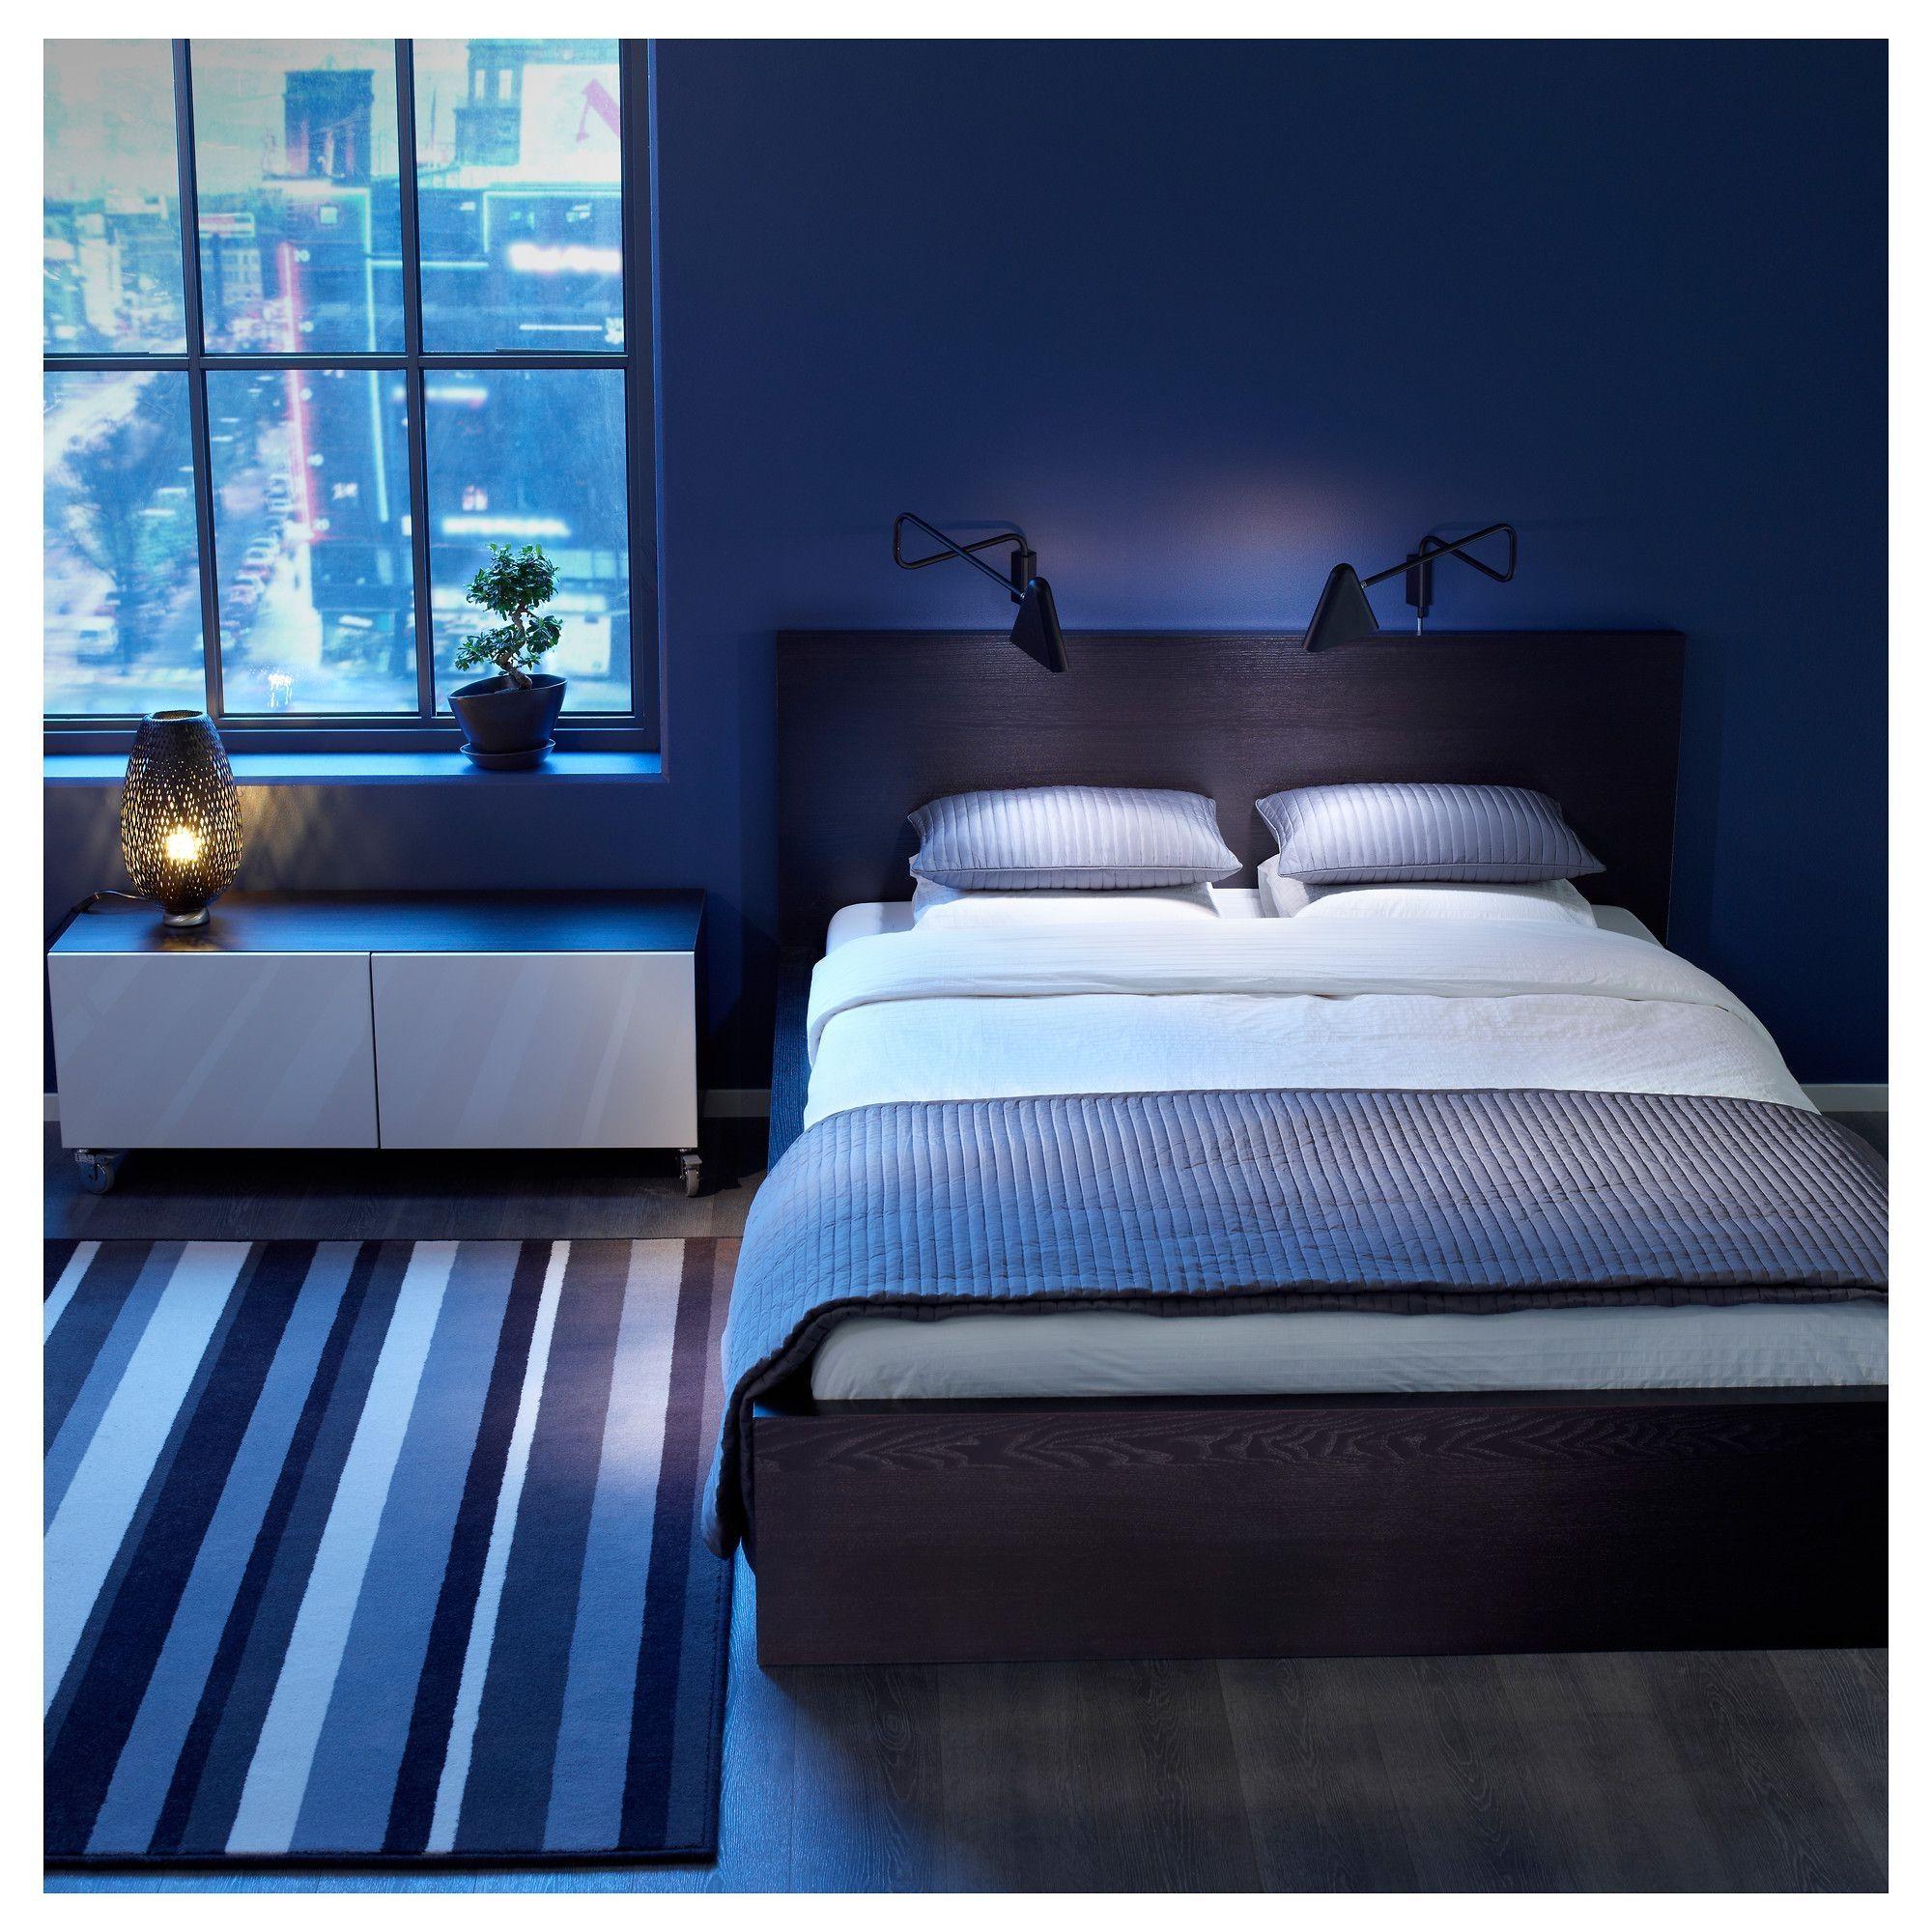 Small Bedroom Ideas For Men Small Bedroom Ideas Smallbedroom Ideas Tags Blue Bedroom Walls Small Bedroom Ideas For Couples Bedroom Ideas For Men Small